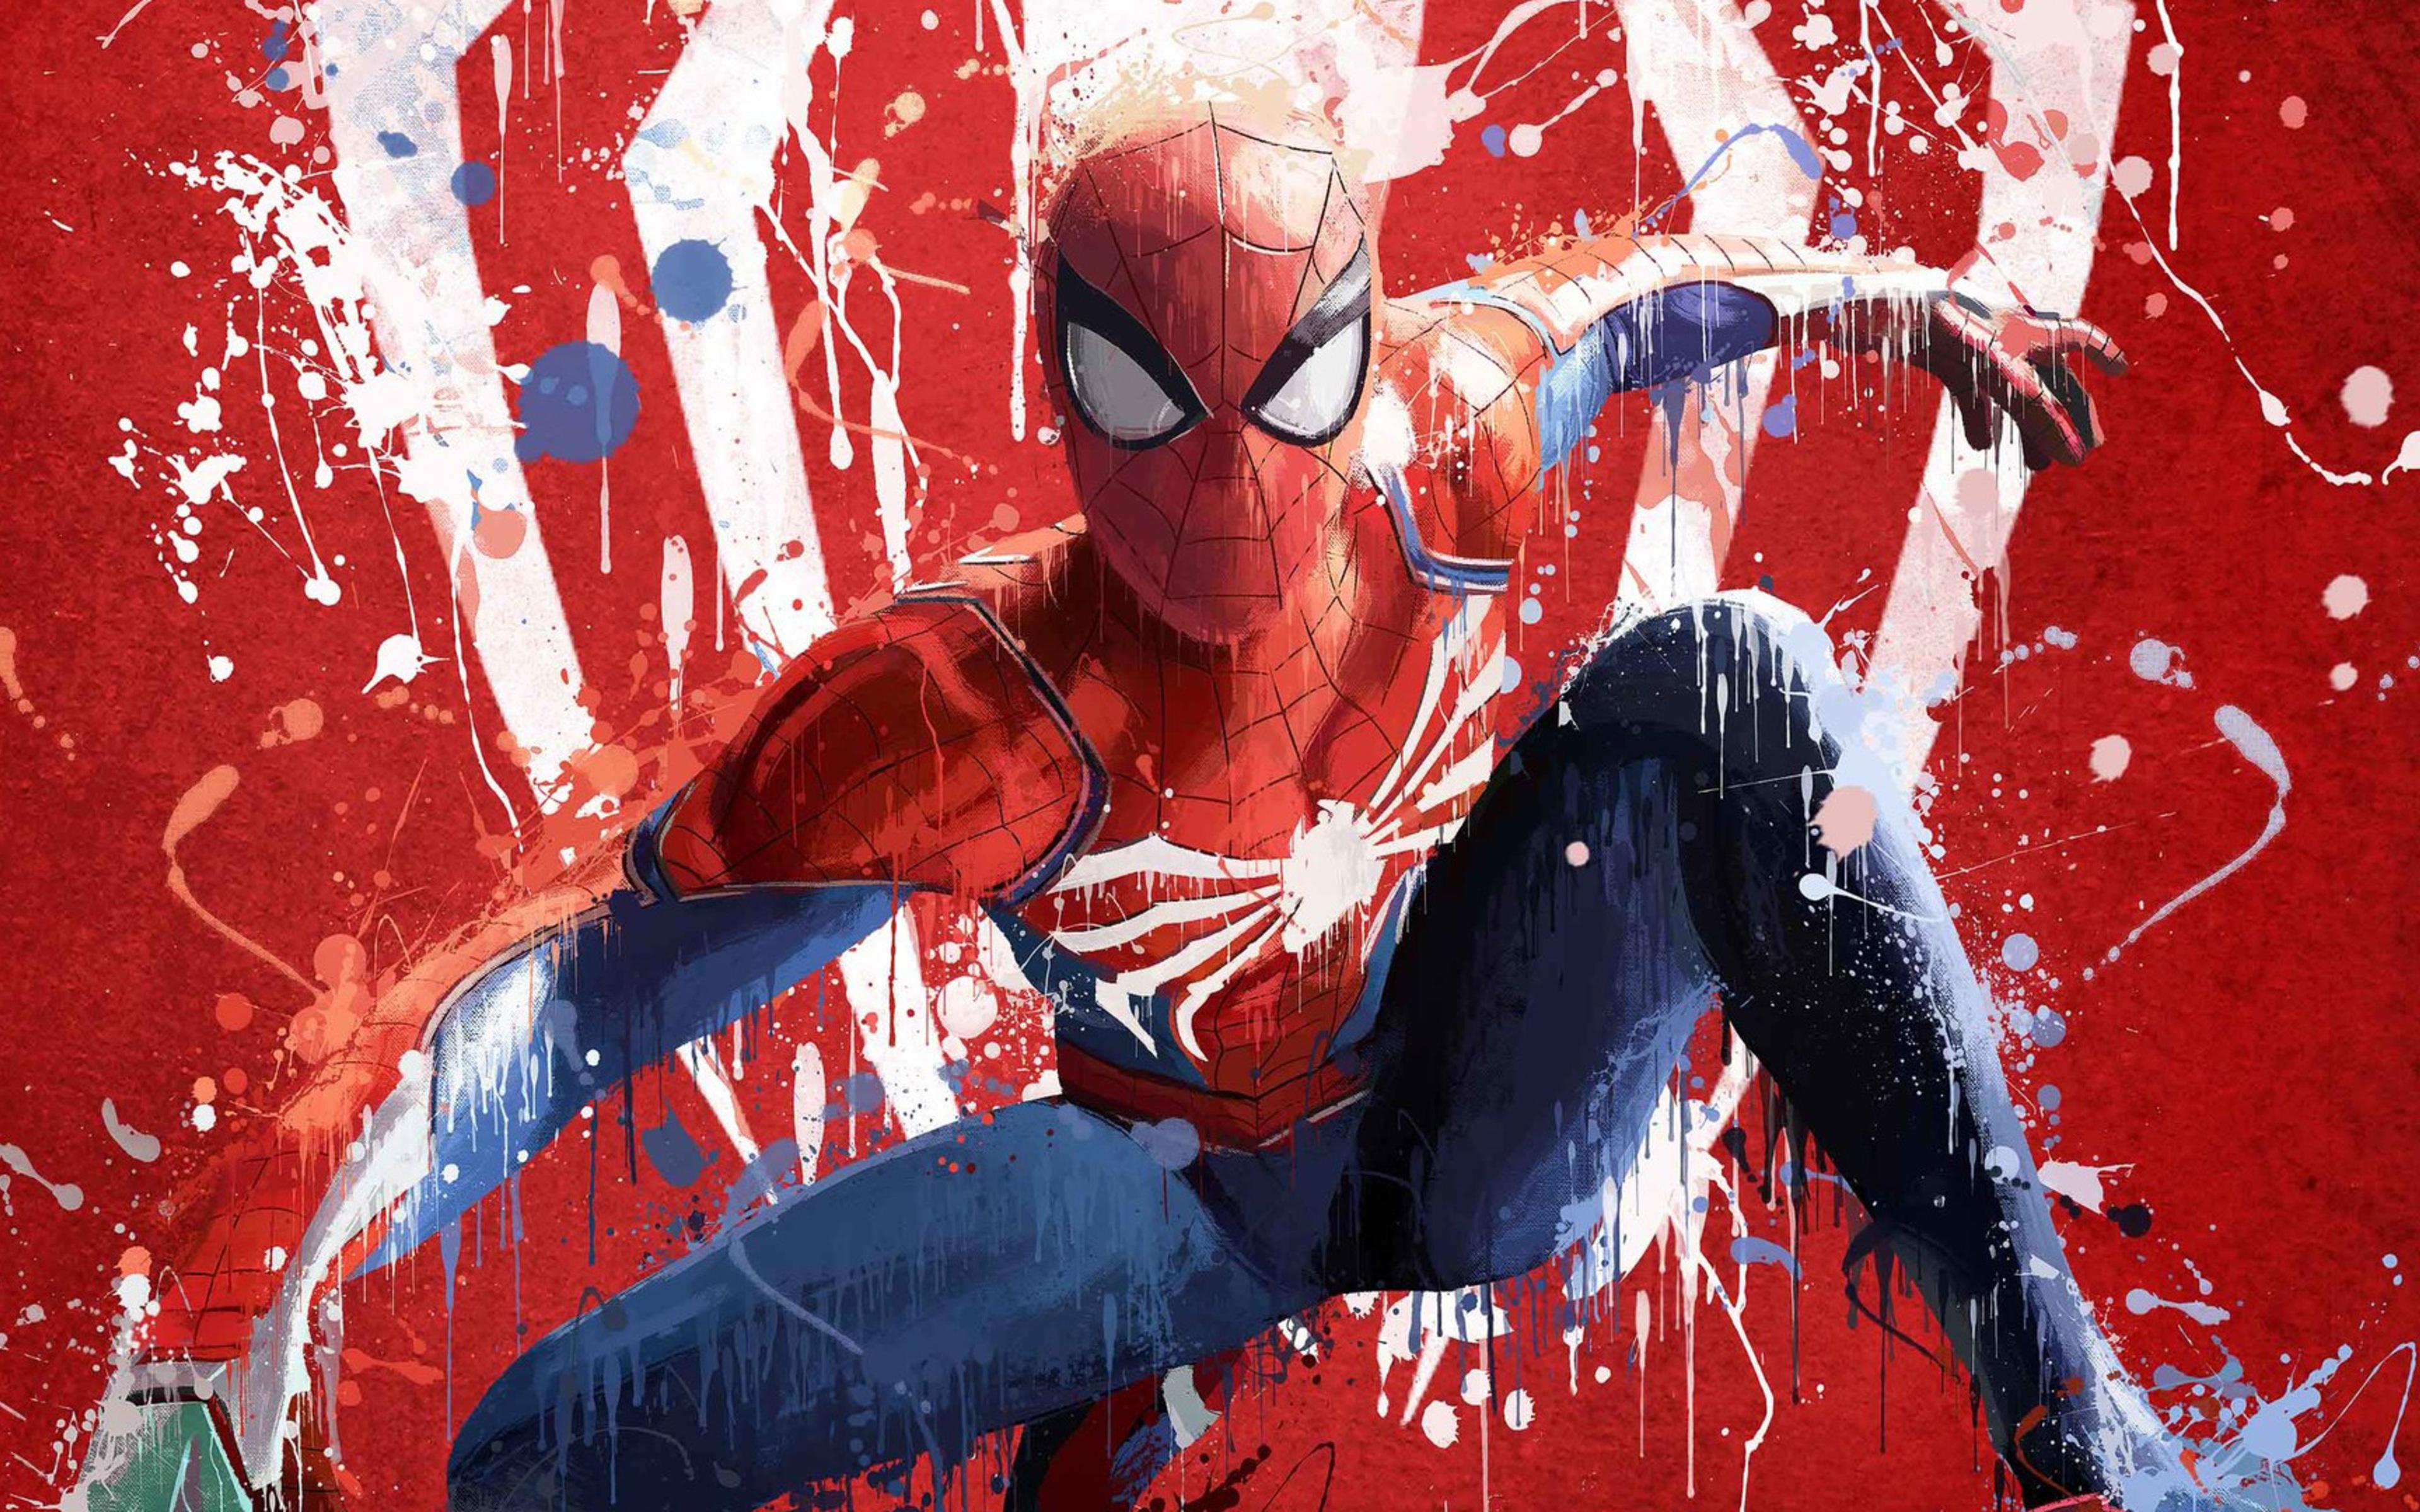 spiderman-ps4-art-2018-ko.jpg